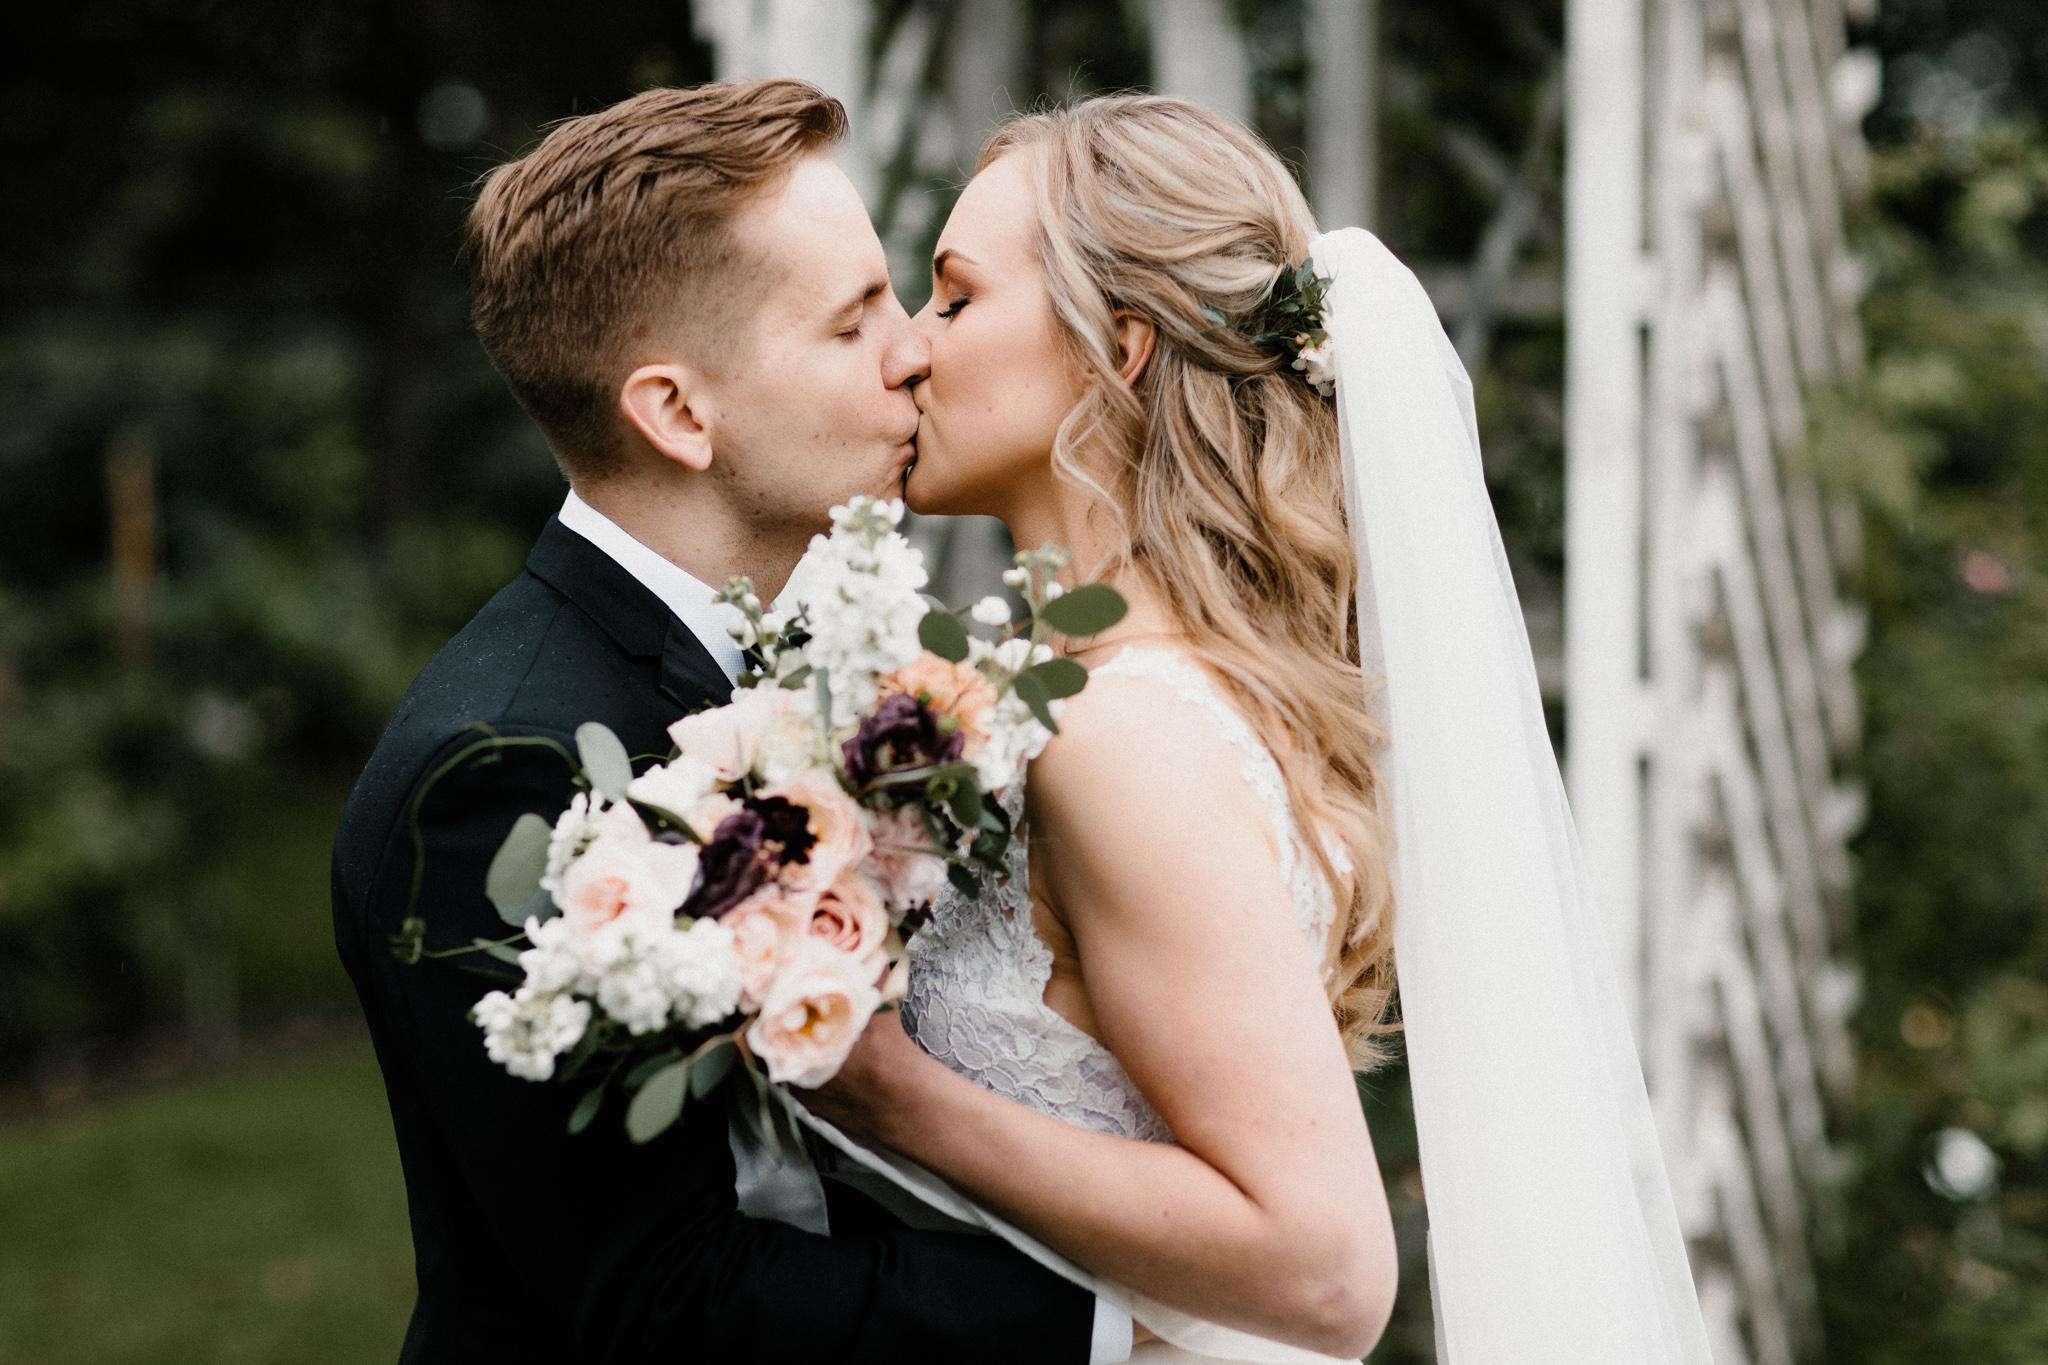 Johanna + Mikko - Tampere - Photo by Patrick Karkkolainen Wedding Photographer-22.jpg